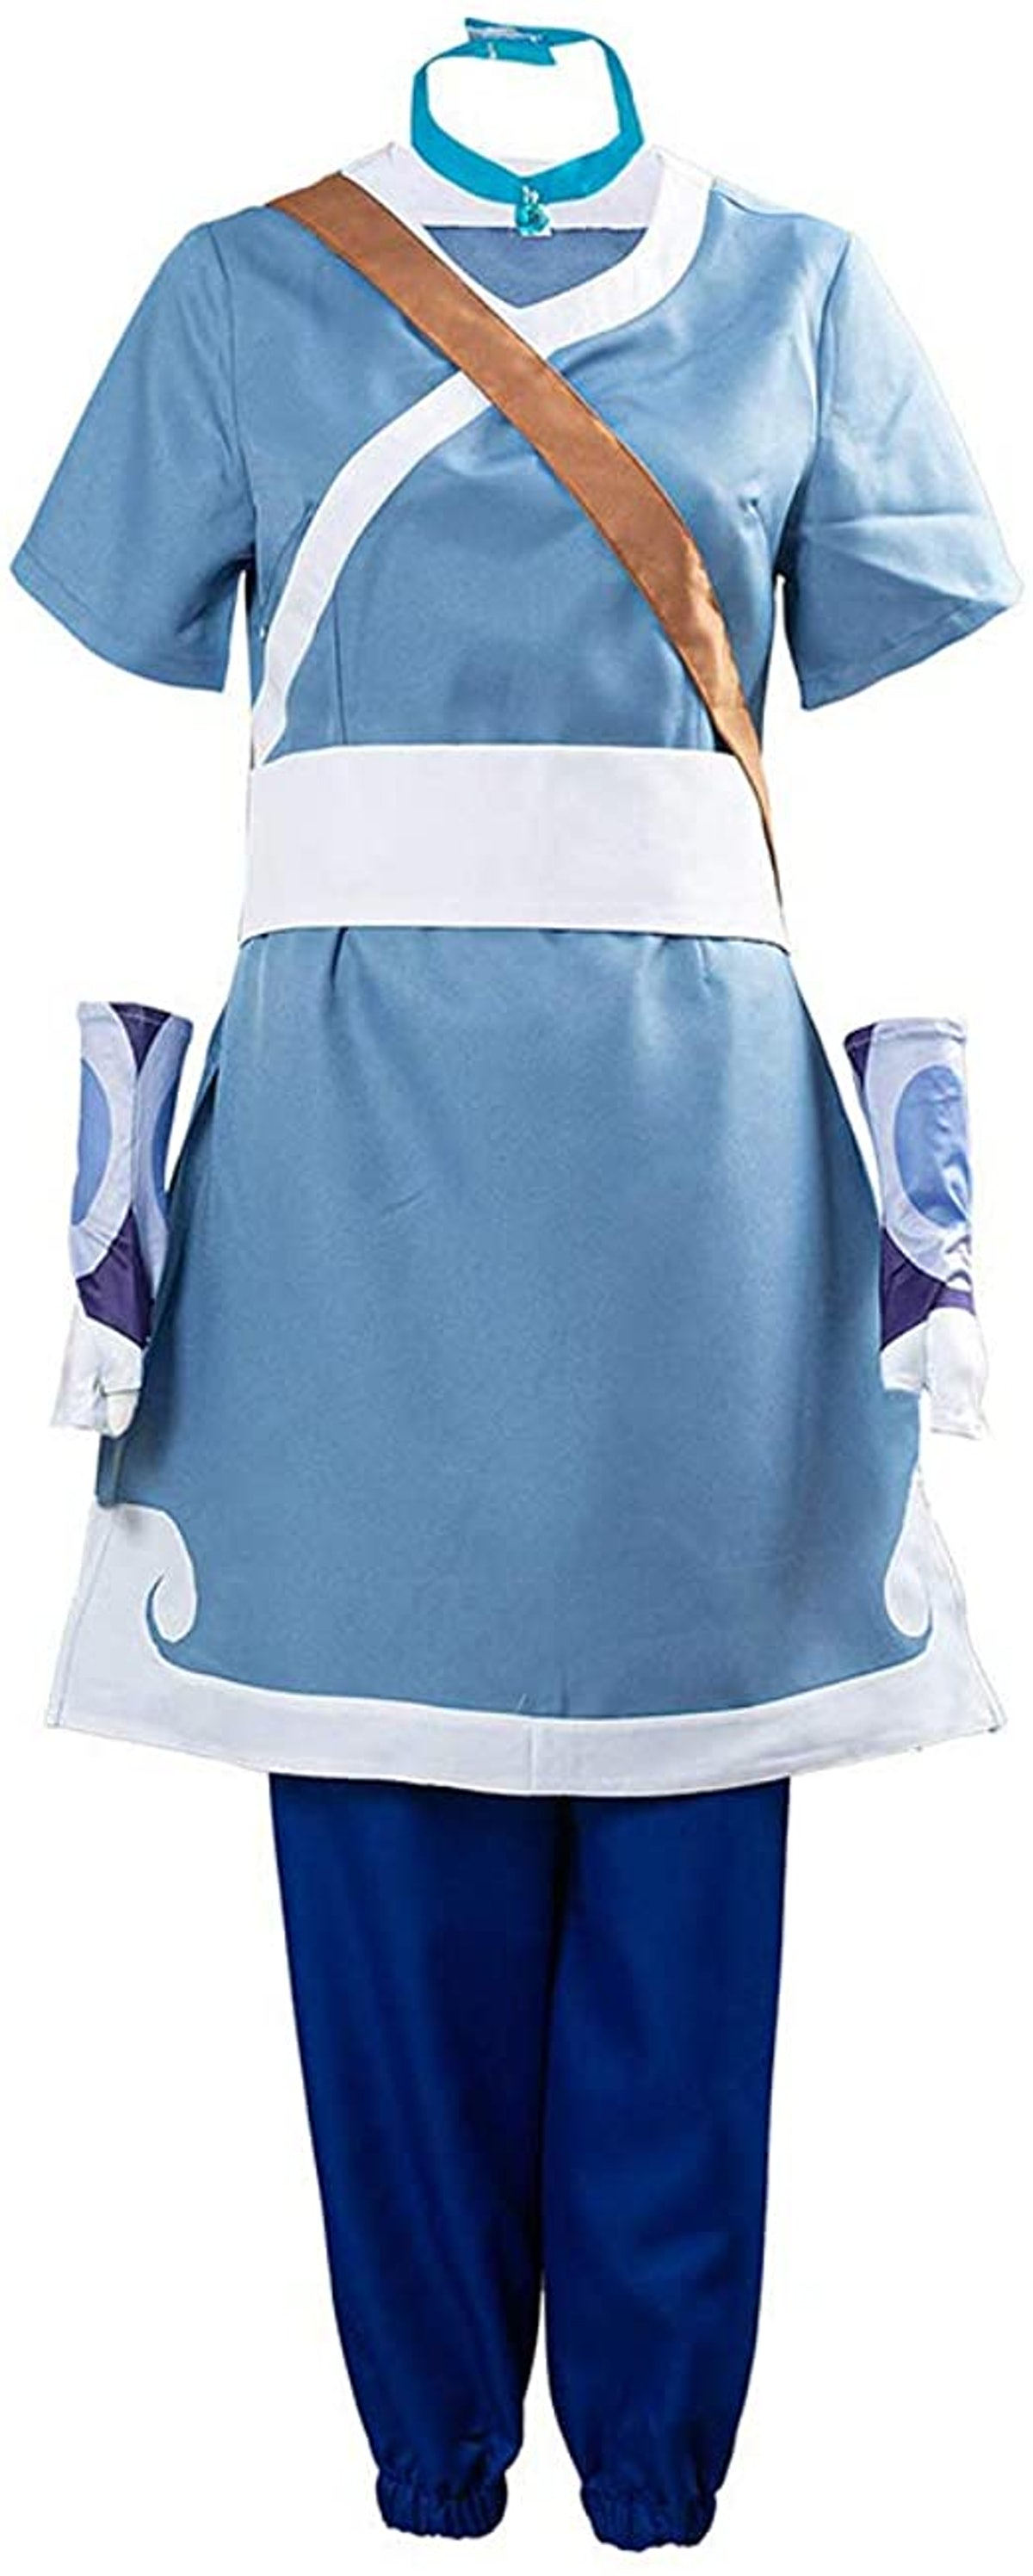 Katara Costume for 'Avatar: The Last Airbender' Halloween Cosplay